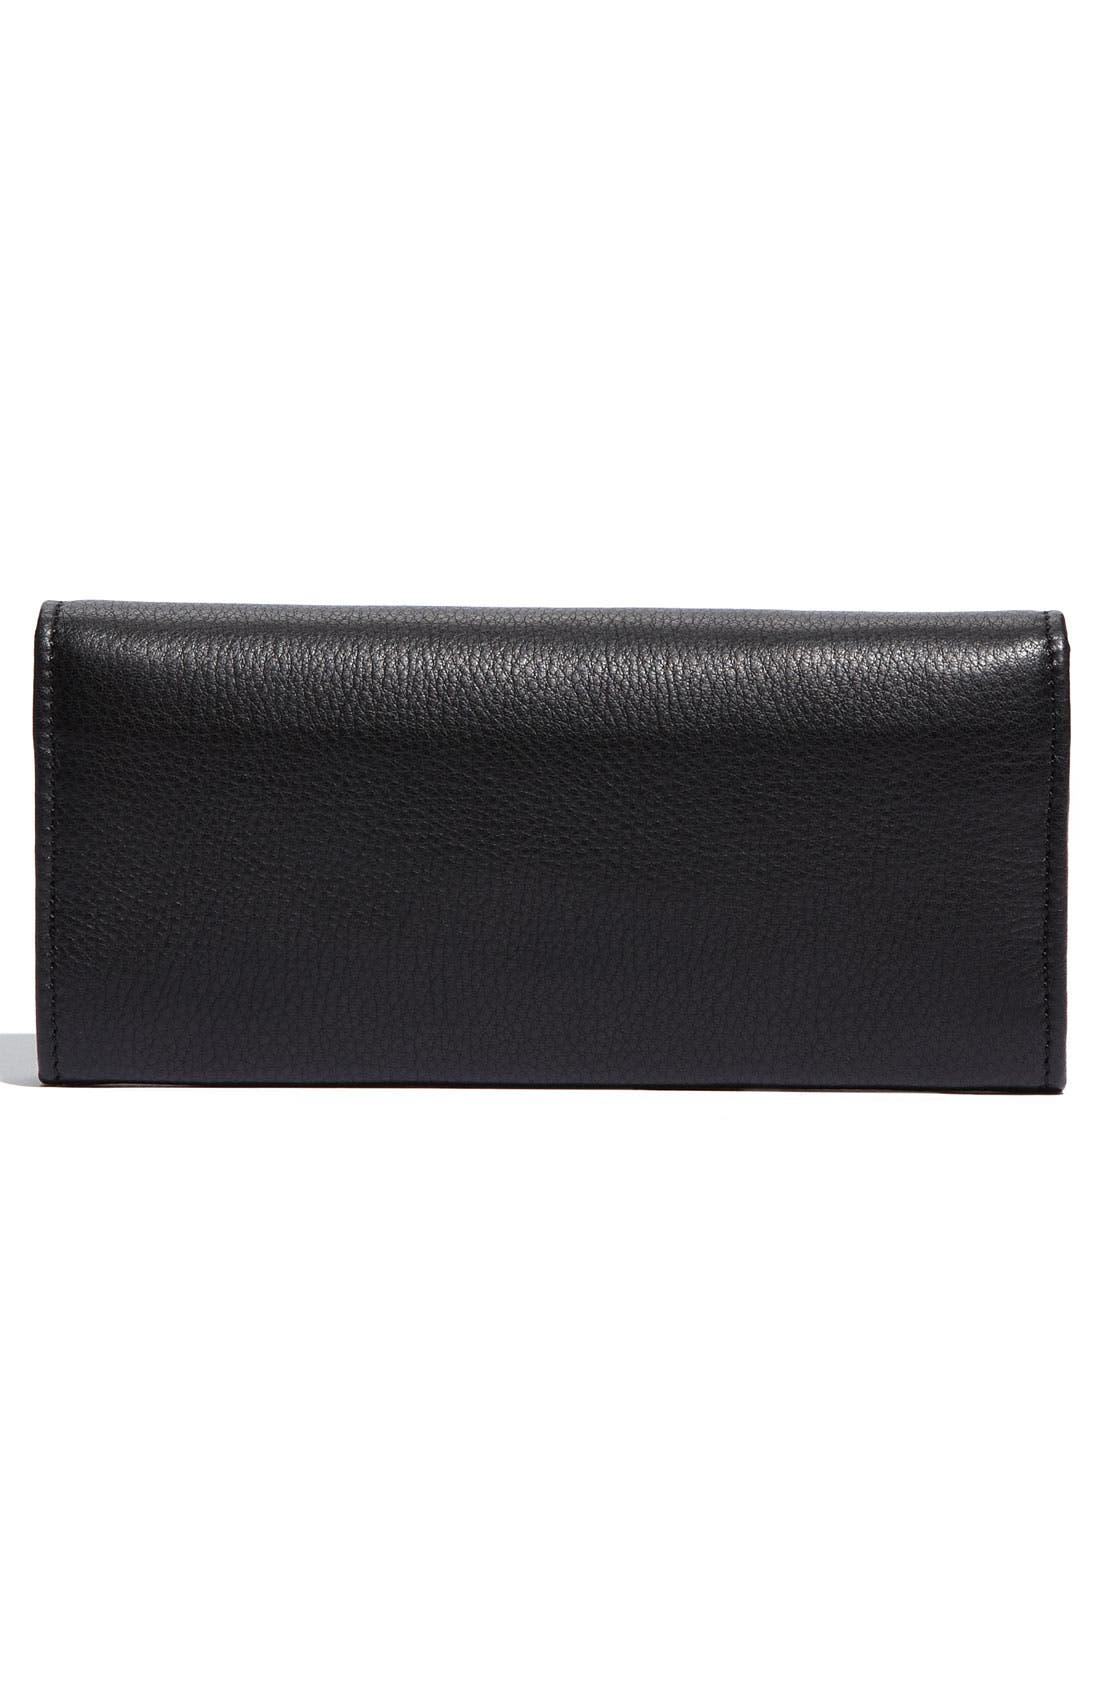 Alternate Image 3  - Jimmy Choo 'Reza' Calfskin Leather Wallet